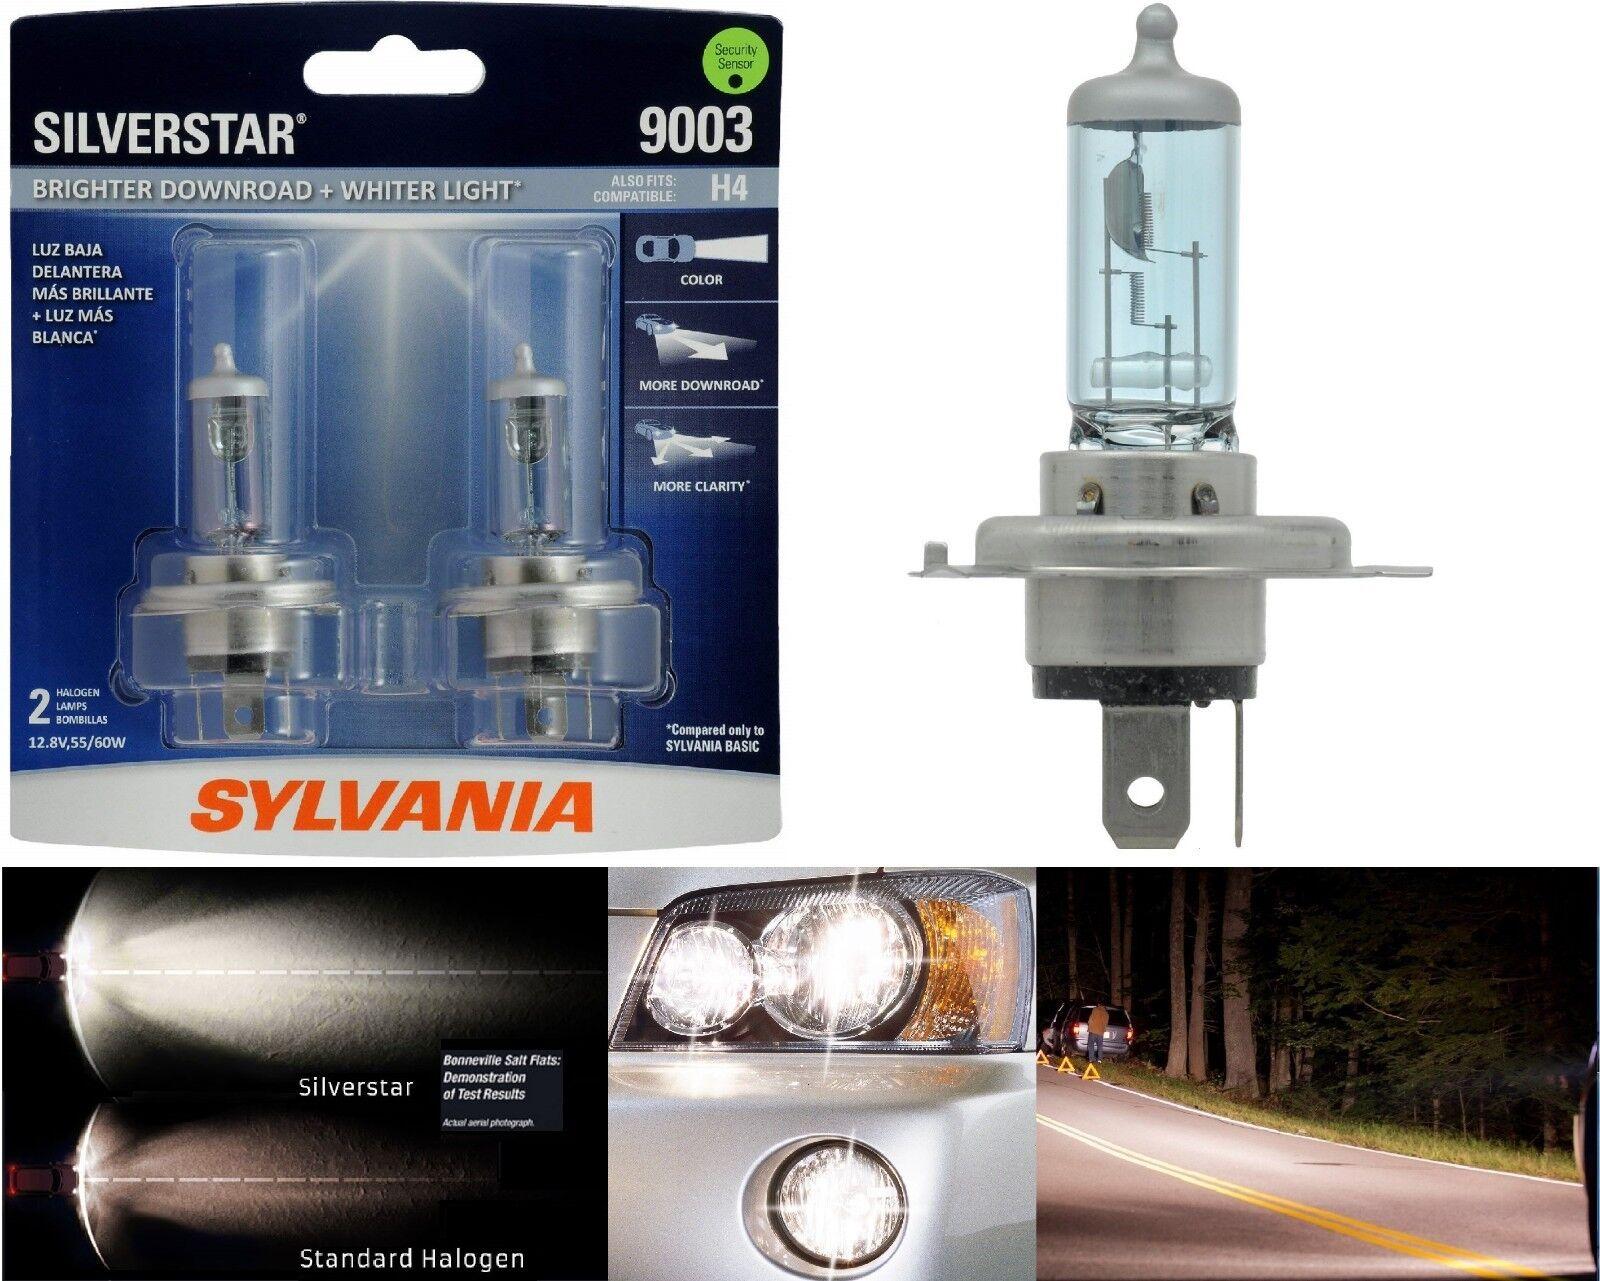 Sylvania Silverstar 9003 HB2 H4 60/55W Two Bulbs Head Light Replace Snowmobile